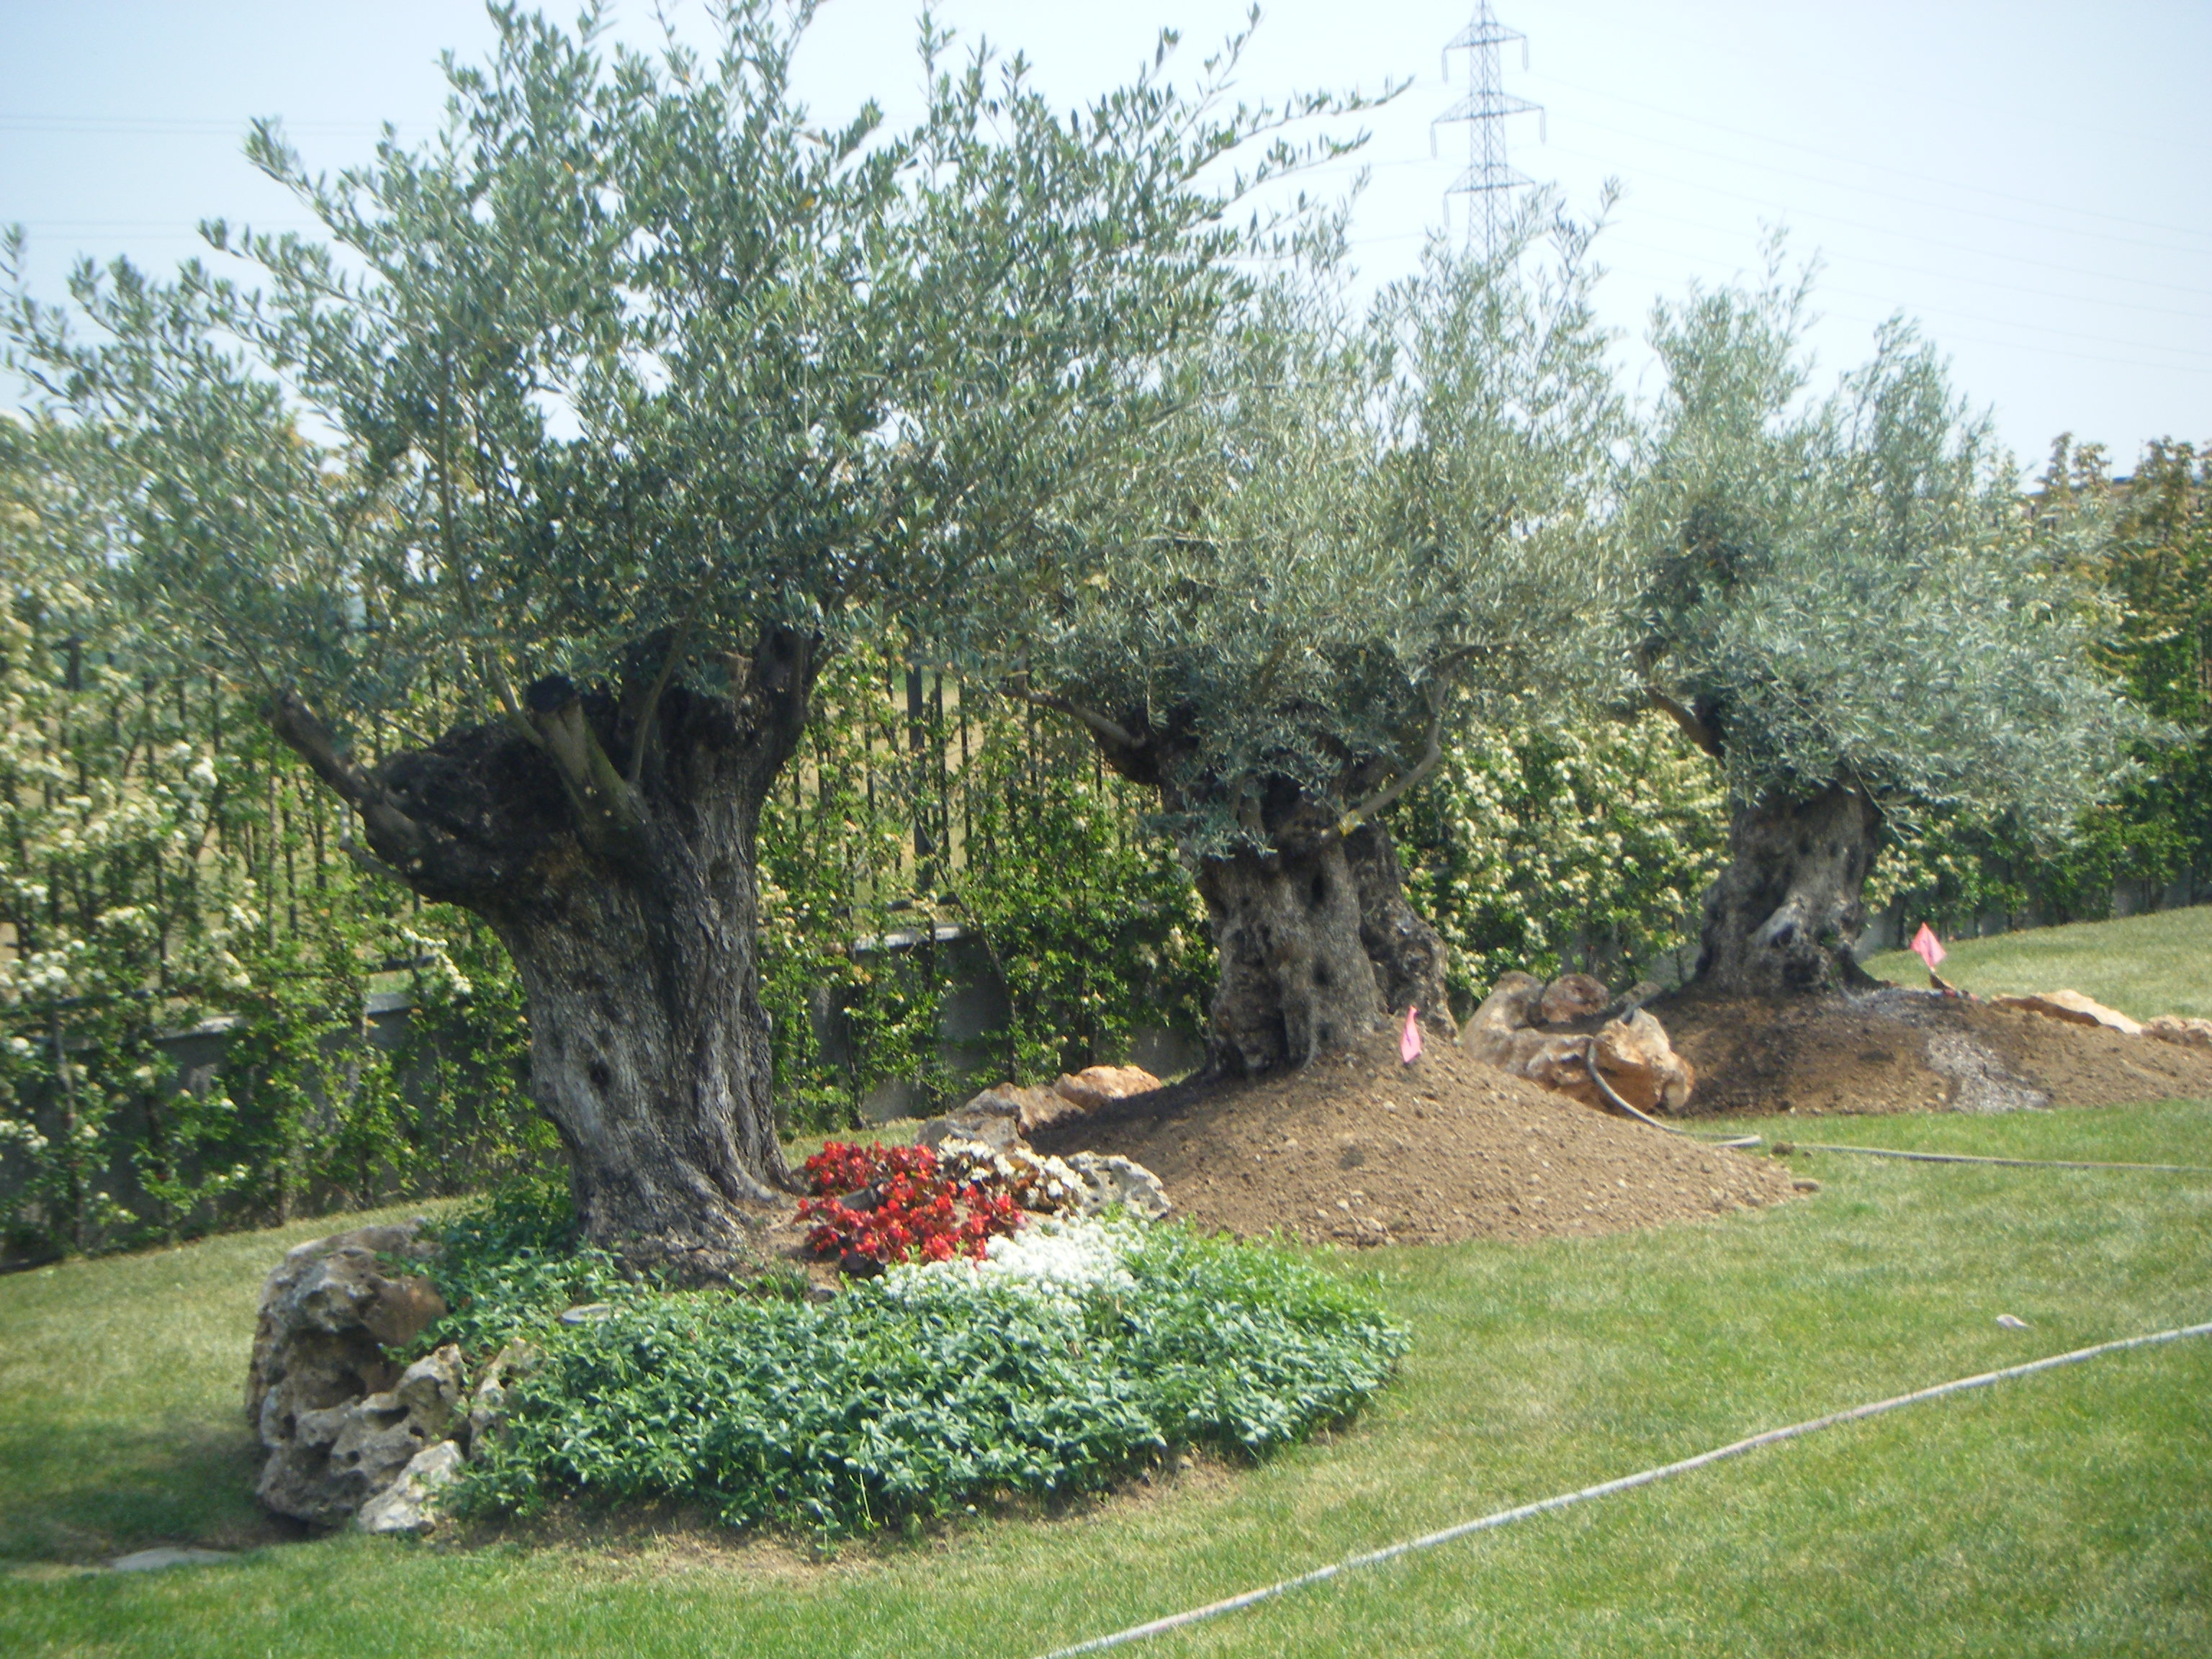 Vendita alberi da giardino - Prezzi alberi da giardino ...